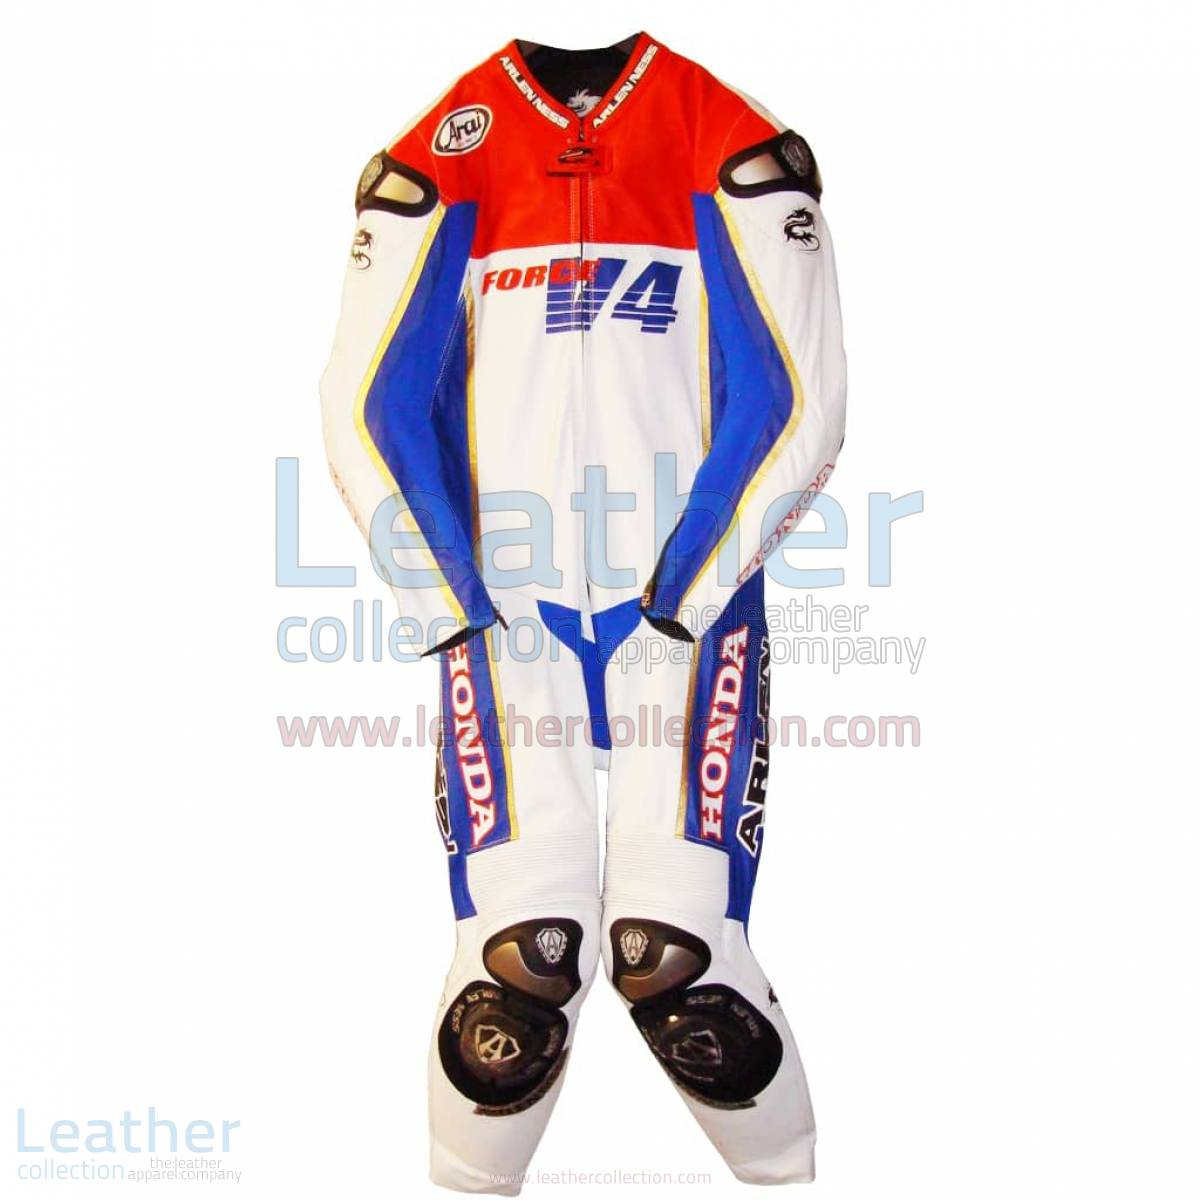 Roger Burnett Honda Goodwood Racing Suit